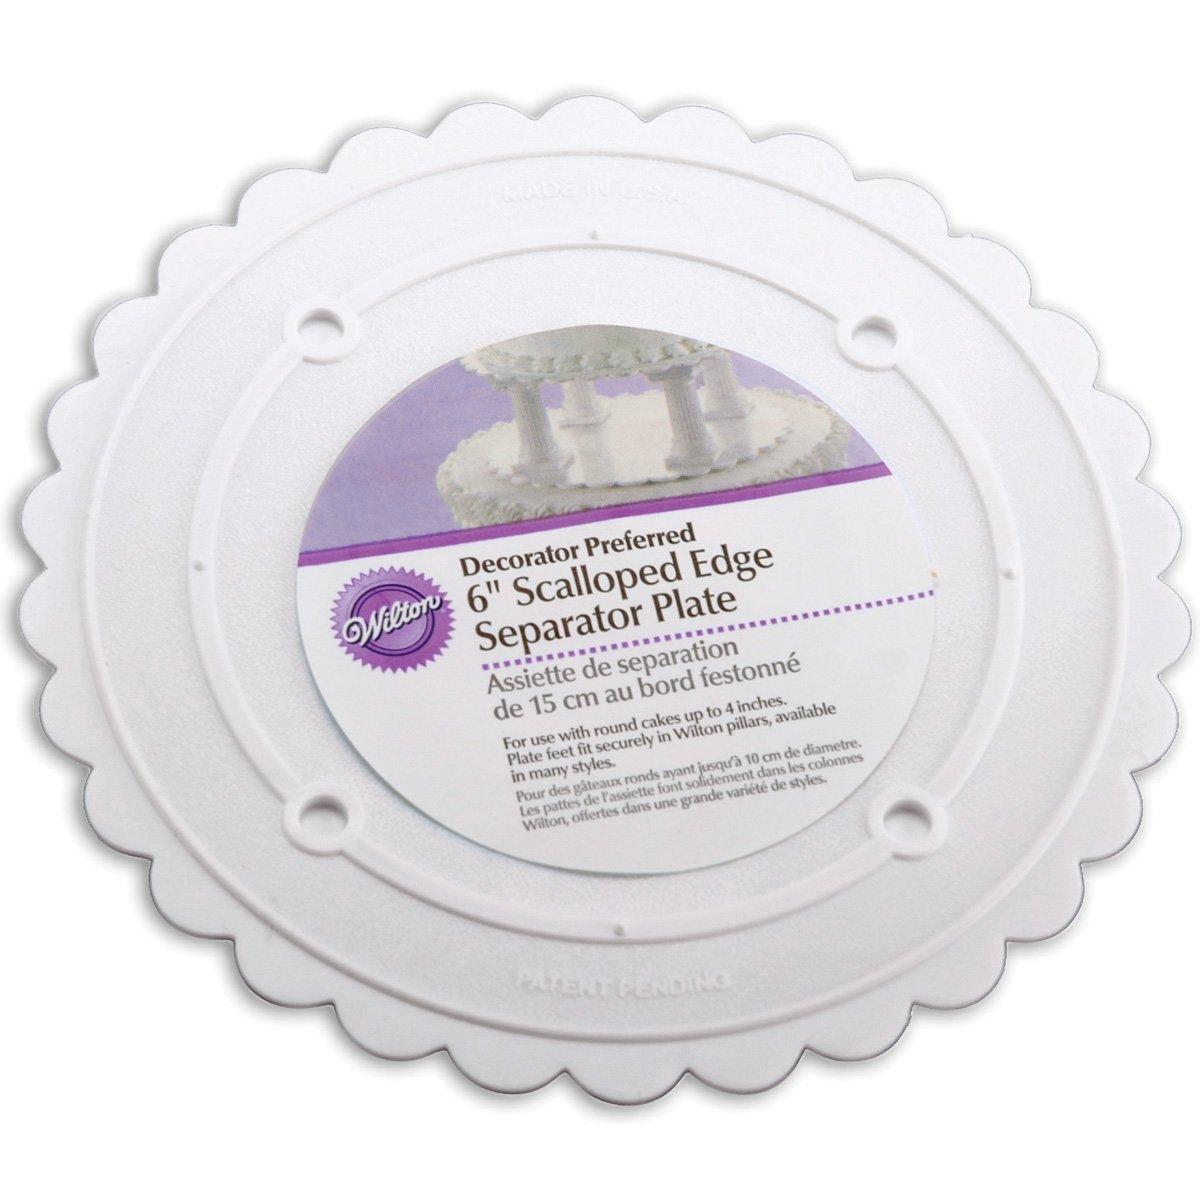 Wilton 302-6 Decorator Preferred Round Separator Plate for Cakes, 6-Inch